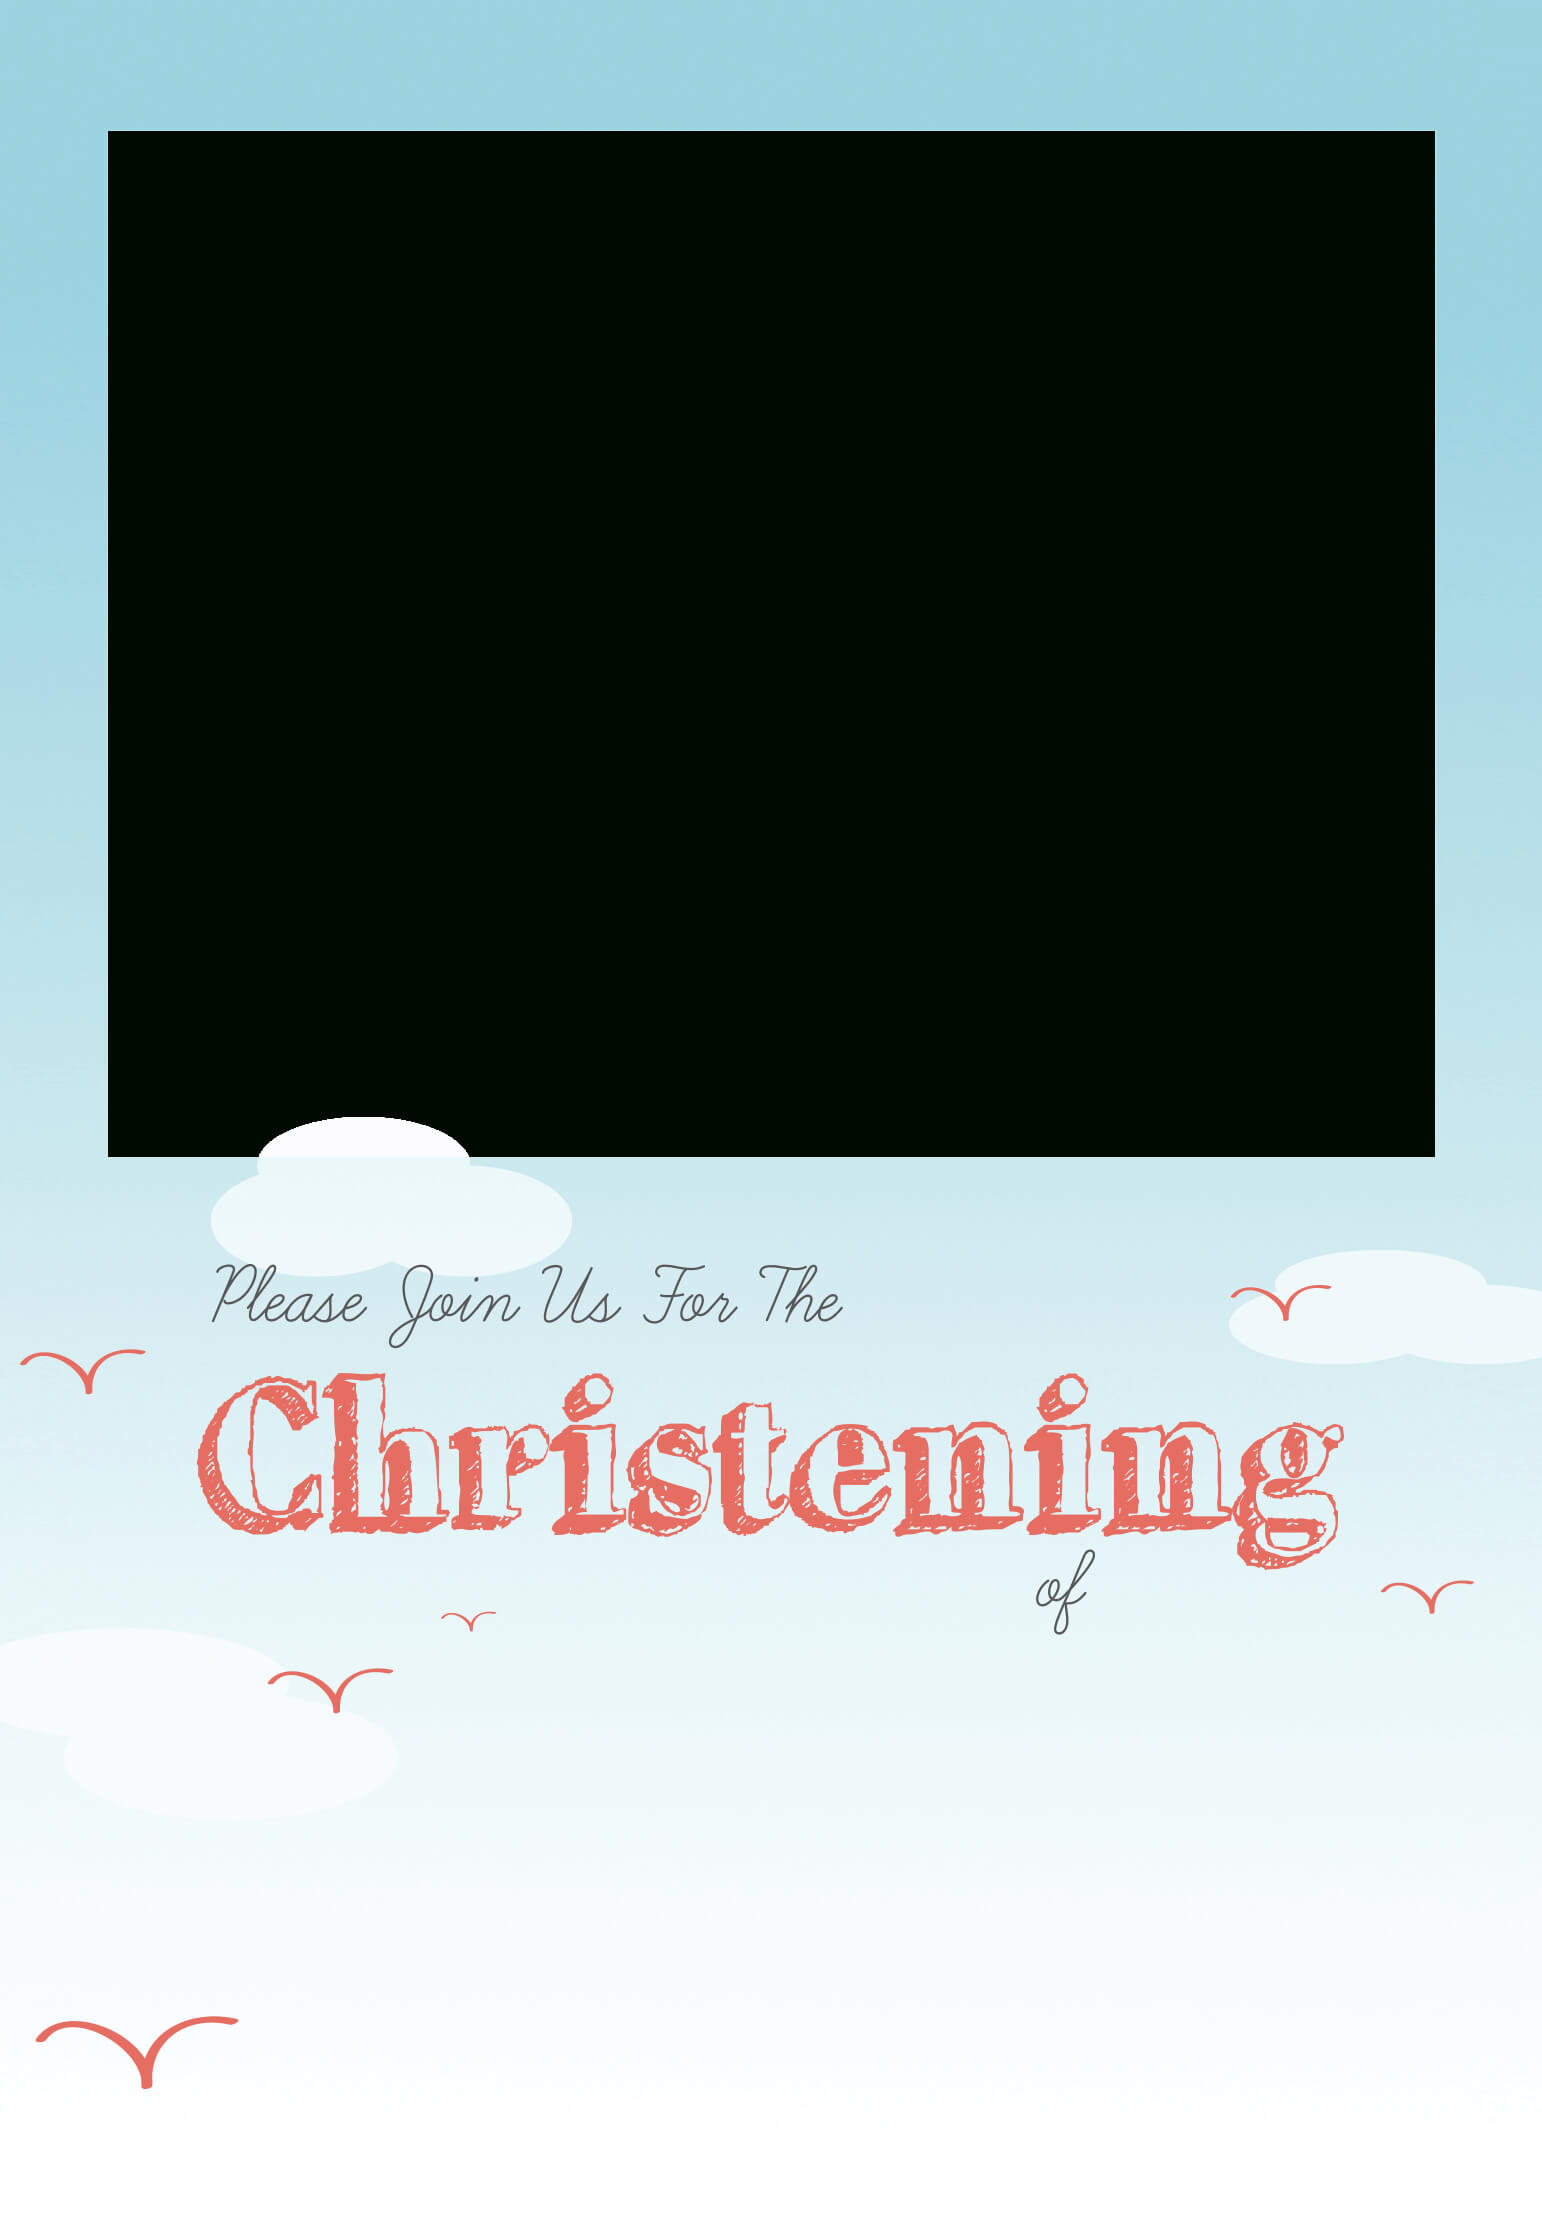 Free Printable Baptism Invitations Templates - Yupar within Blank Christening Invitation Templates